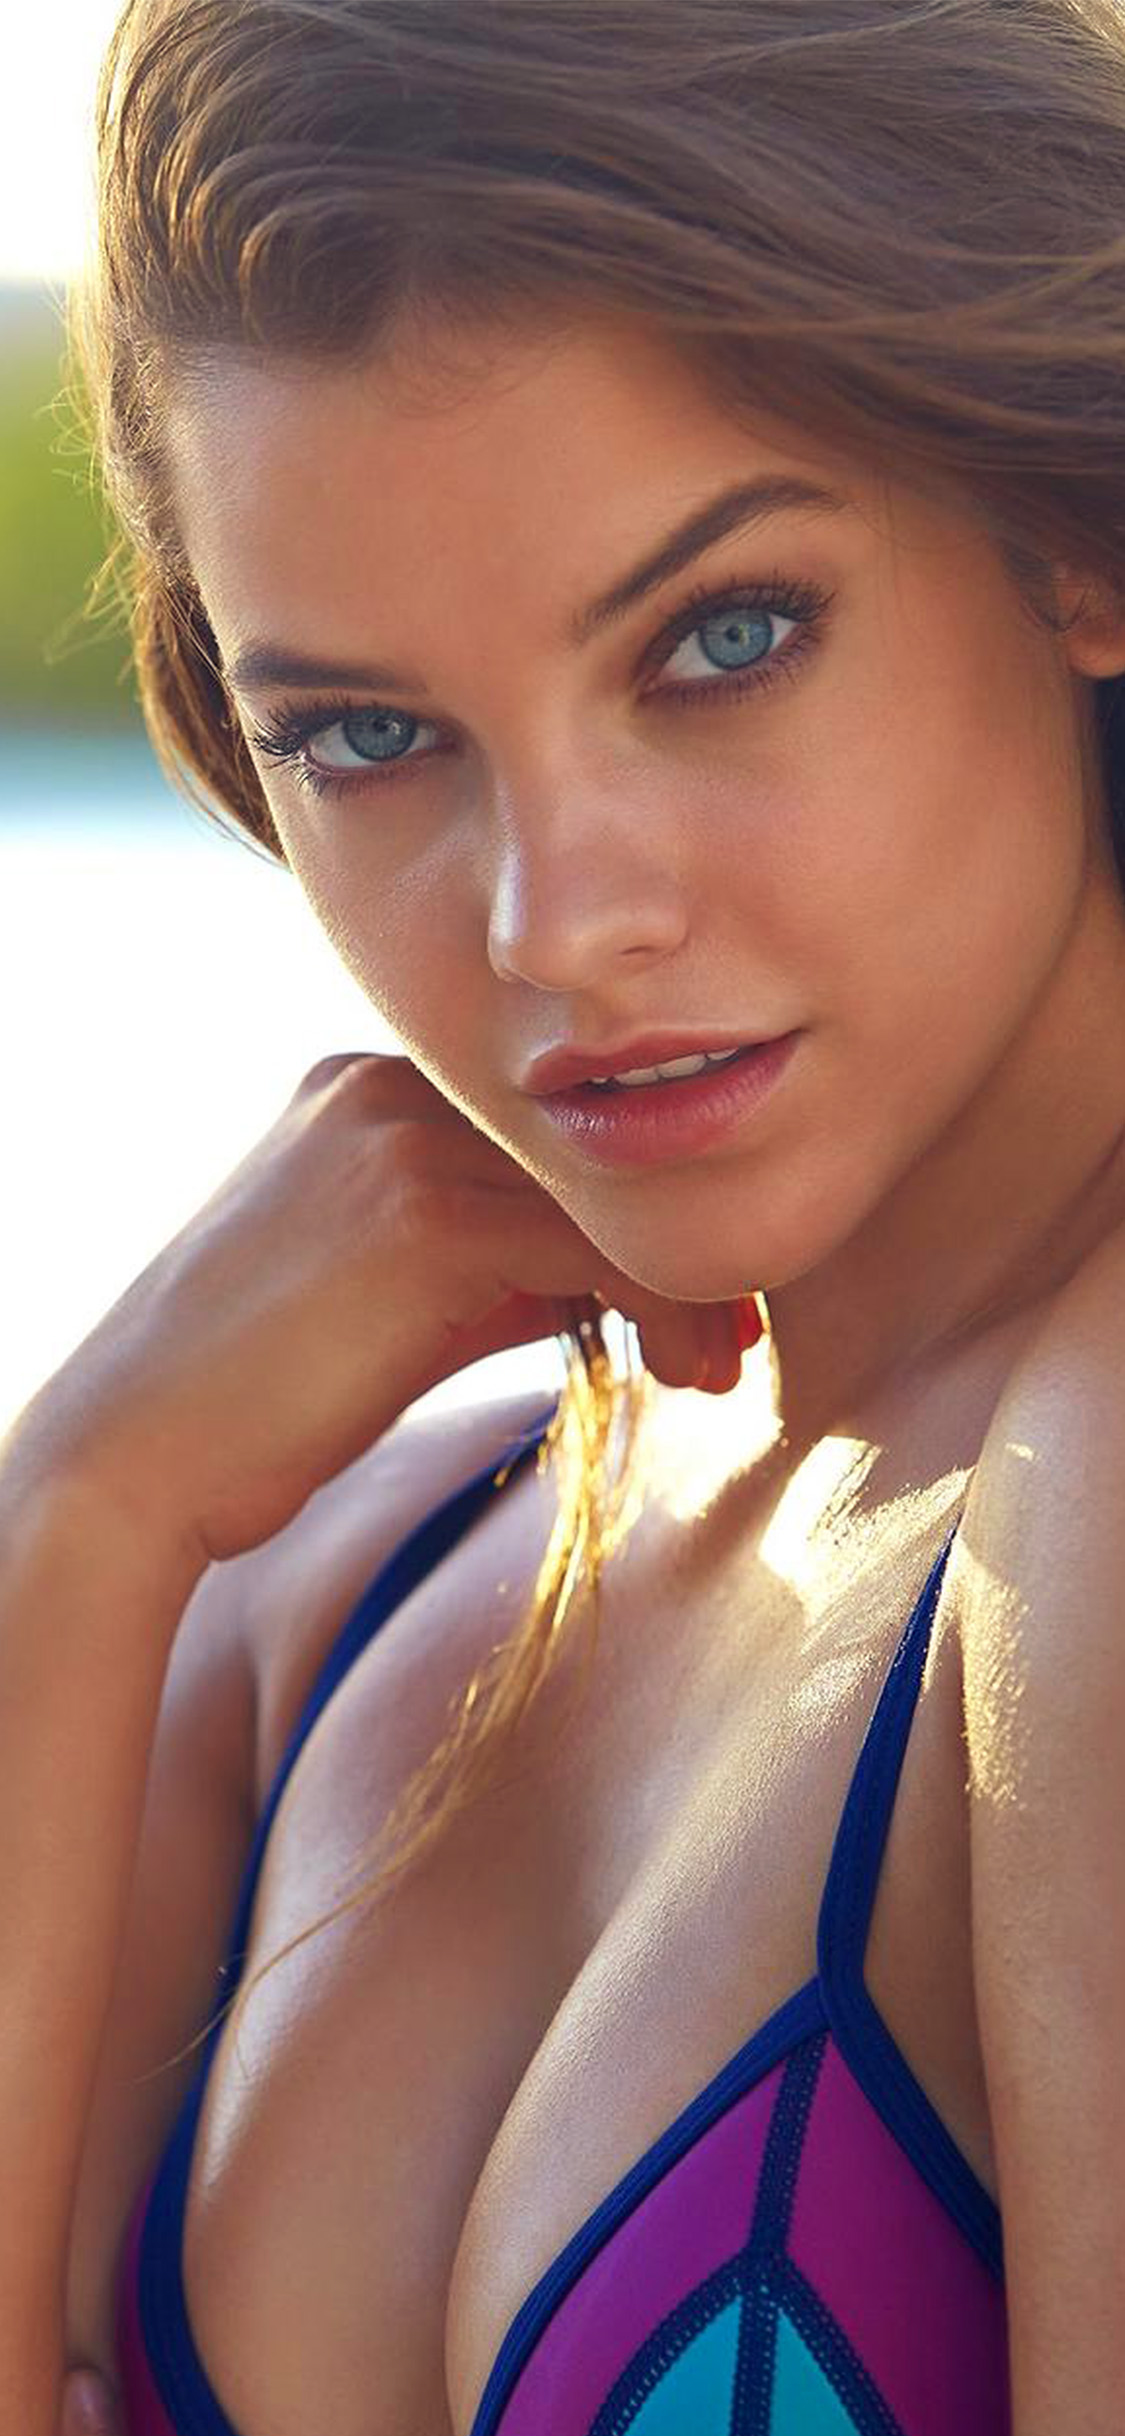 iPhonexpapers.com-Apple-iPhone-wallpaper-hq04-barbara-palvin-bikini-girl-summer-sexy